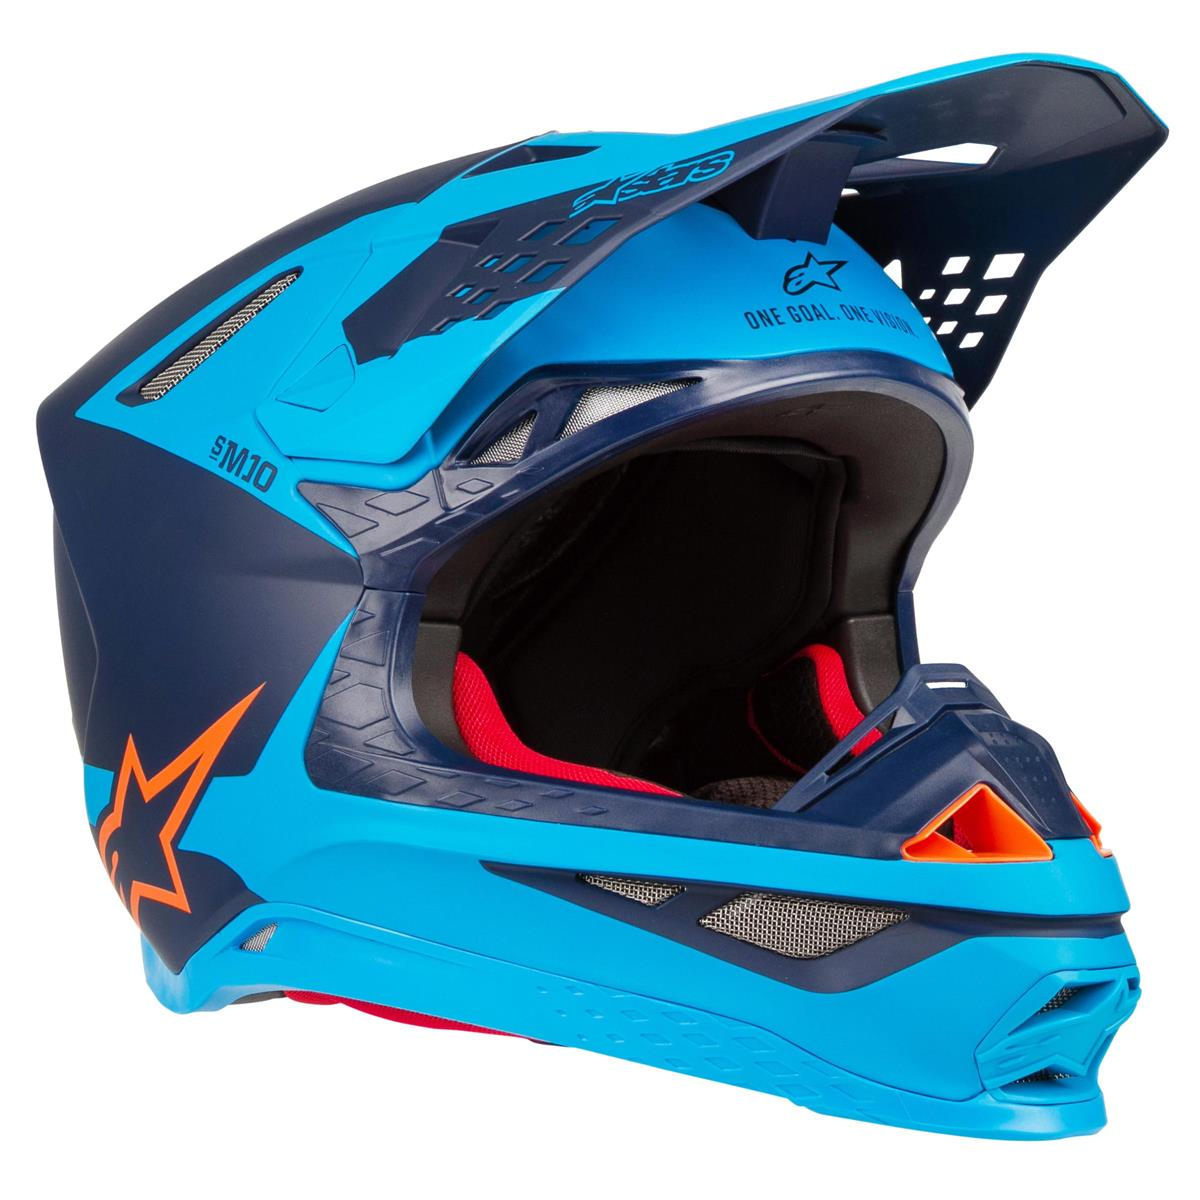 alpinestars-helm-helmet-supertech-s-m10-2 (2)